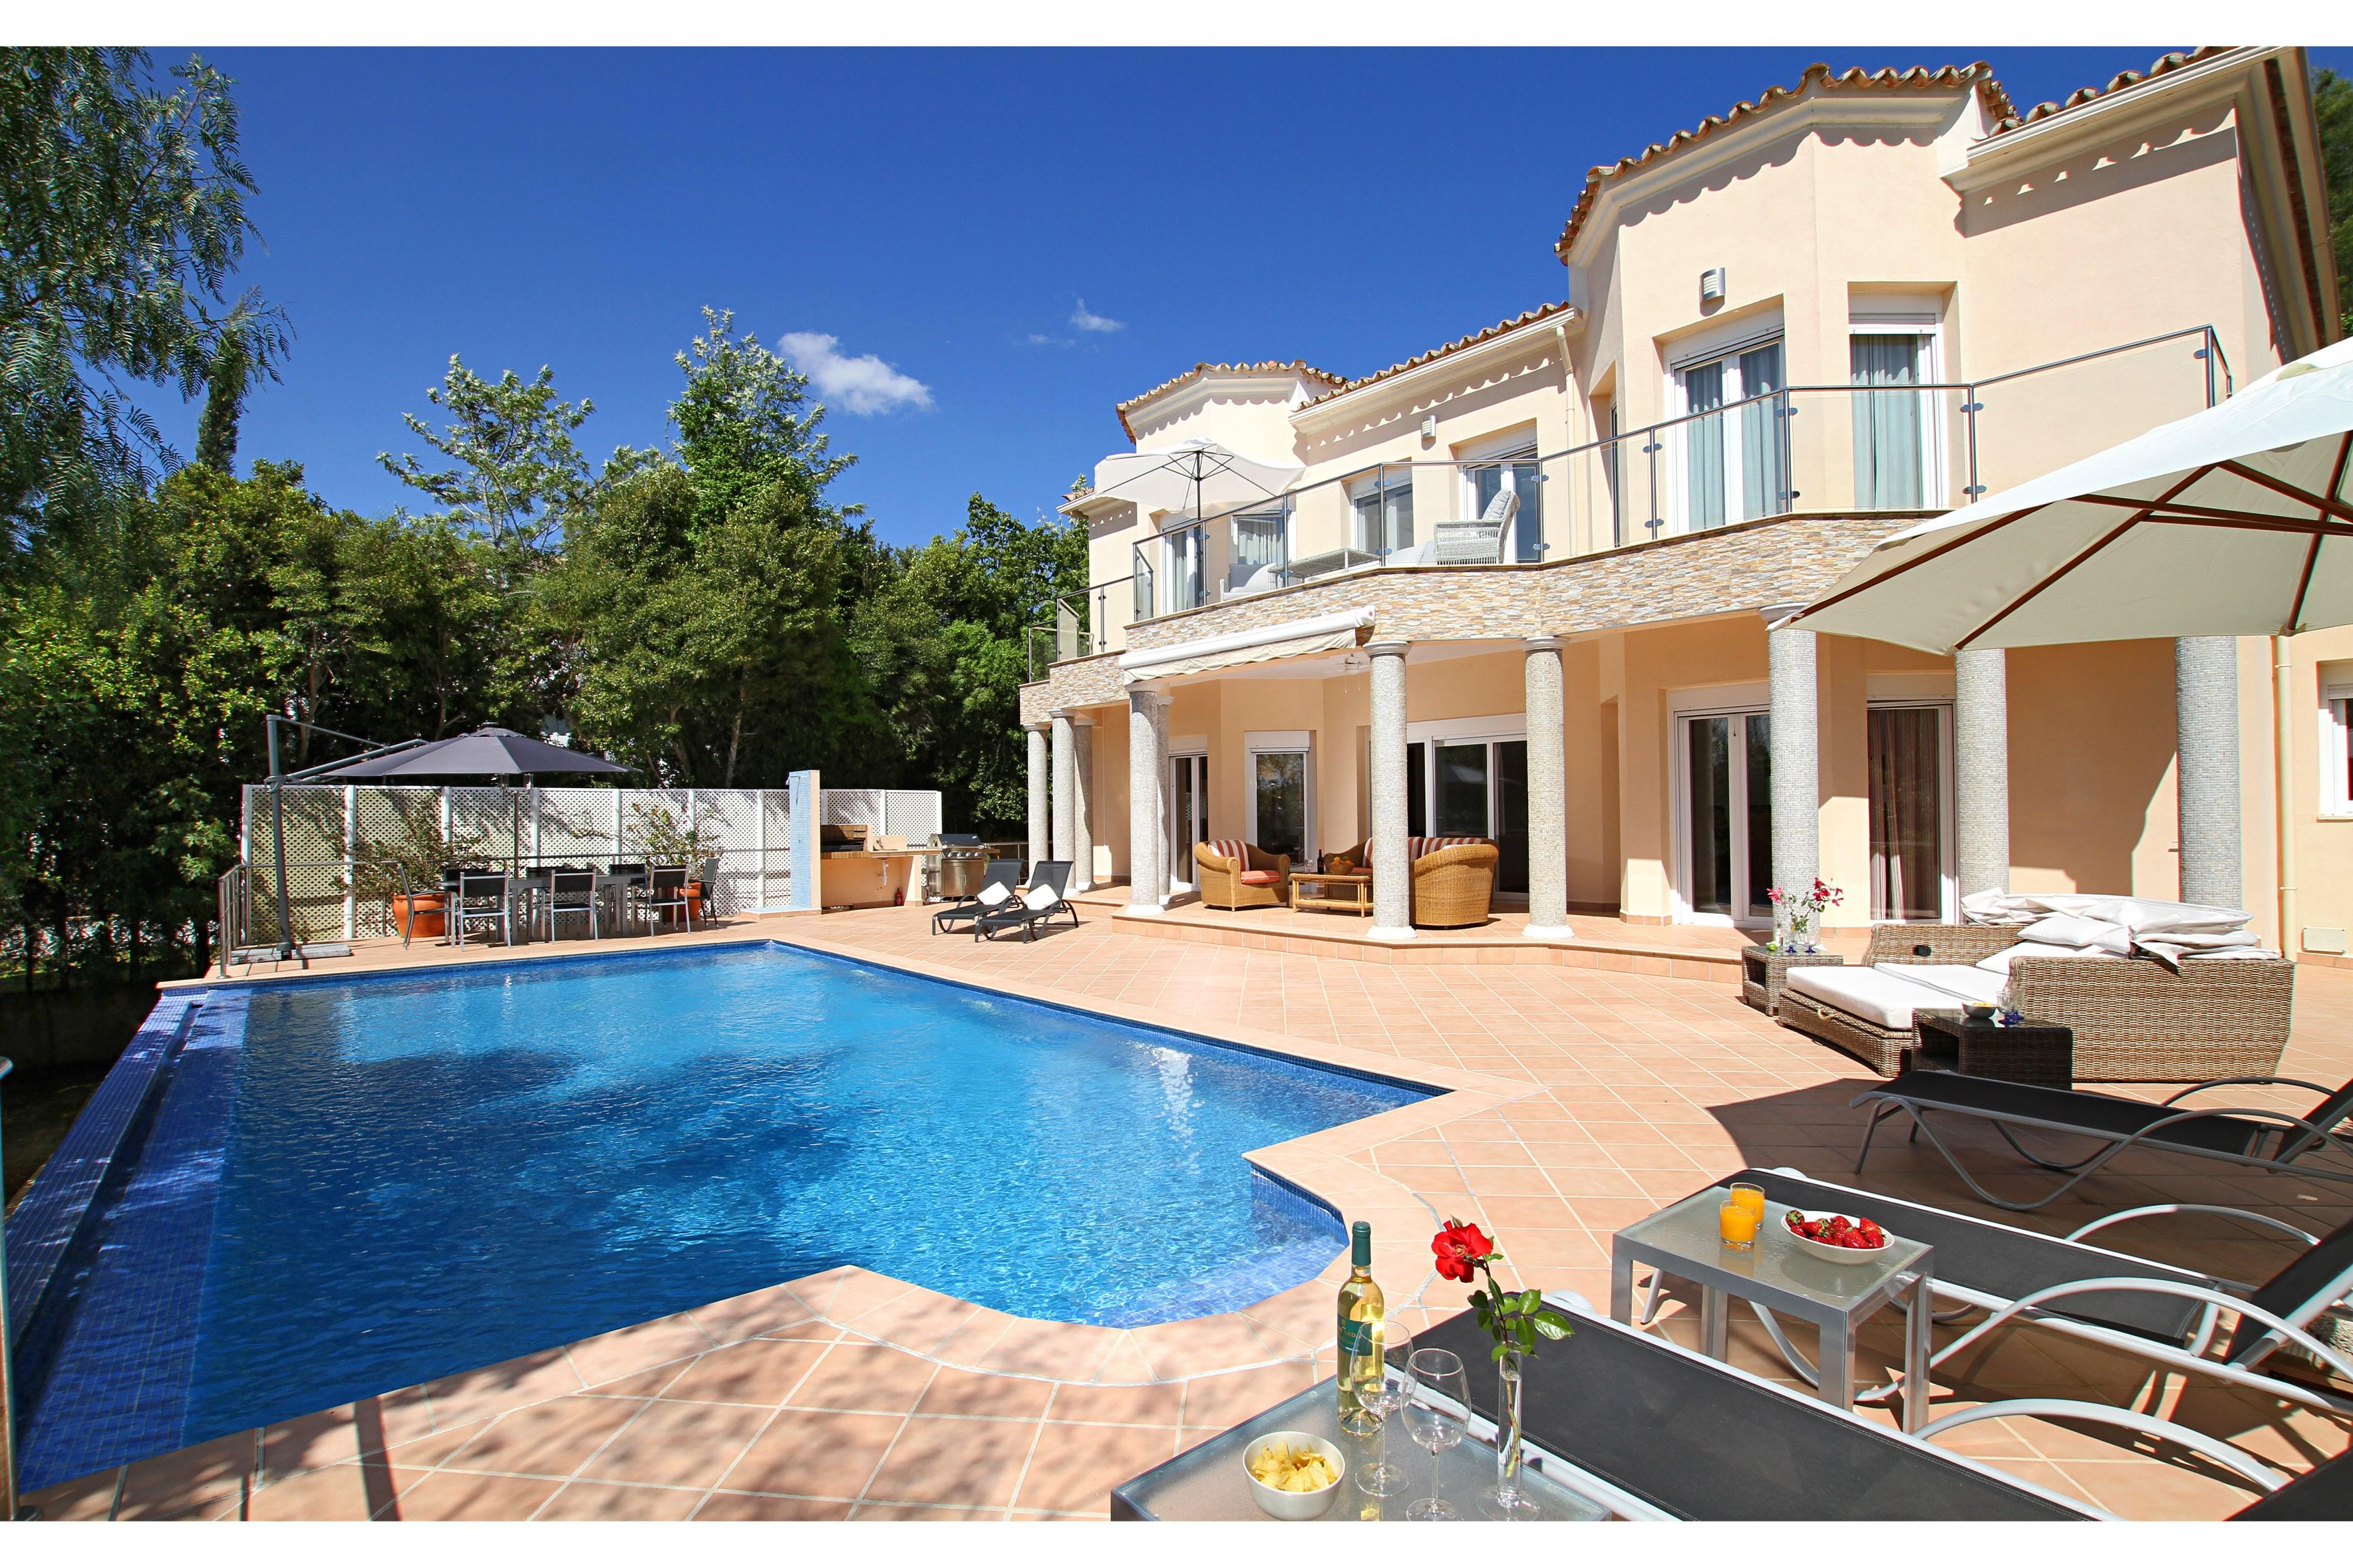 Villa Merlin Is A Holiday Villa In Pollensa Mallorca